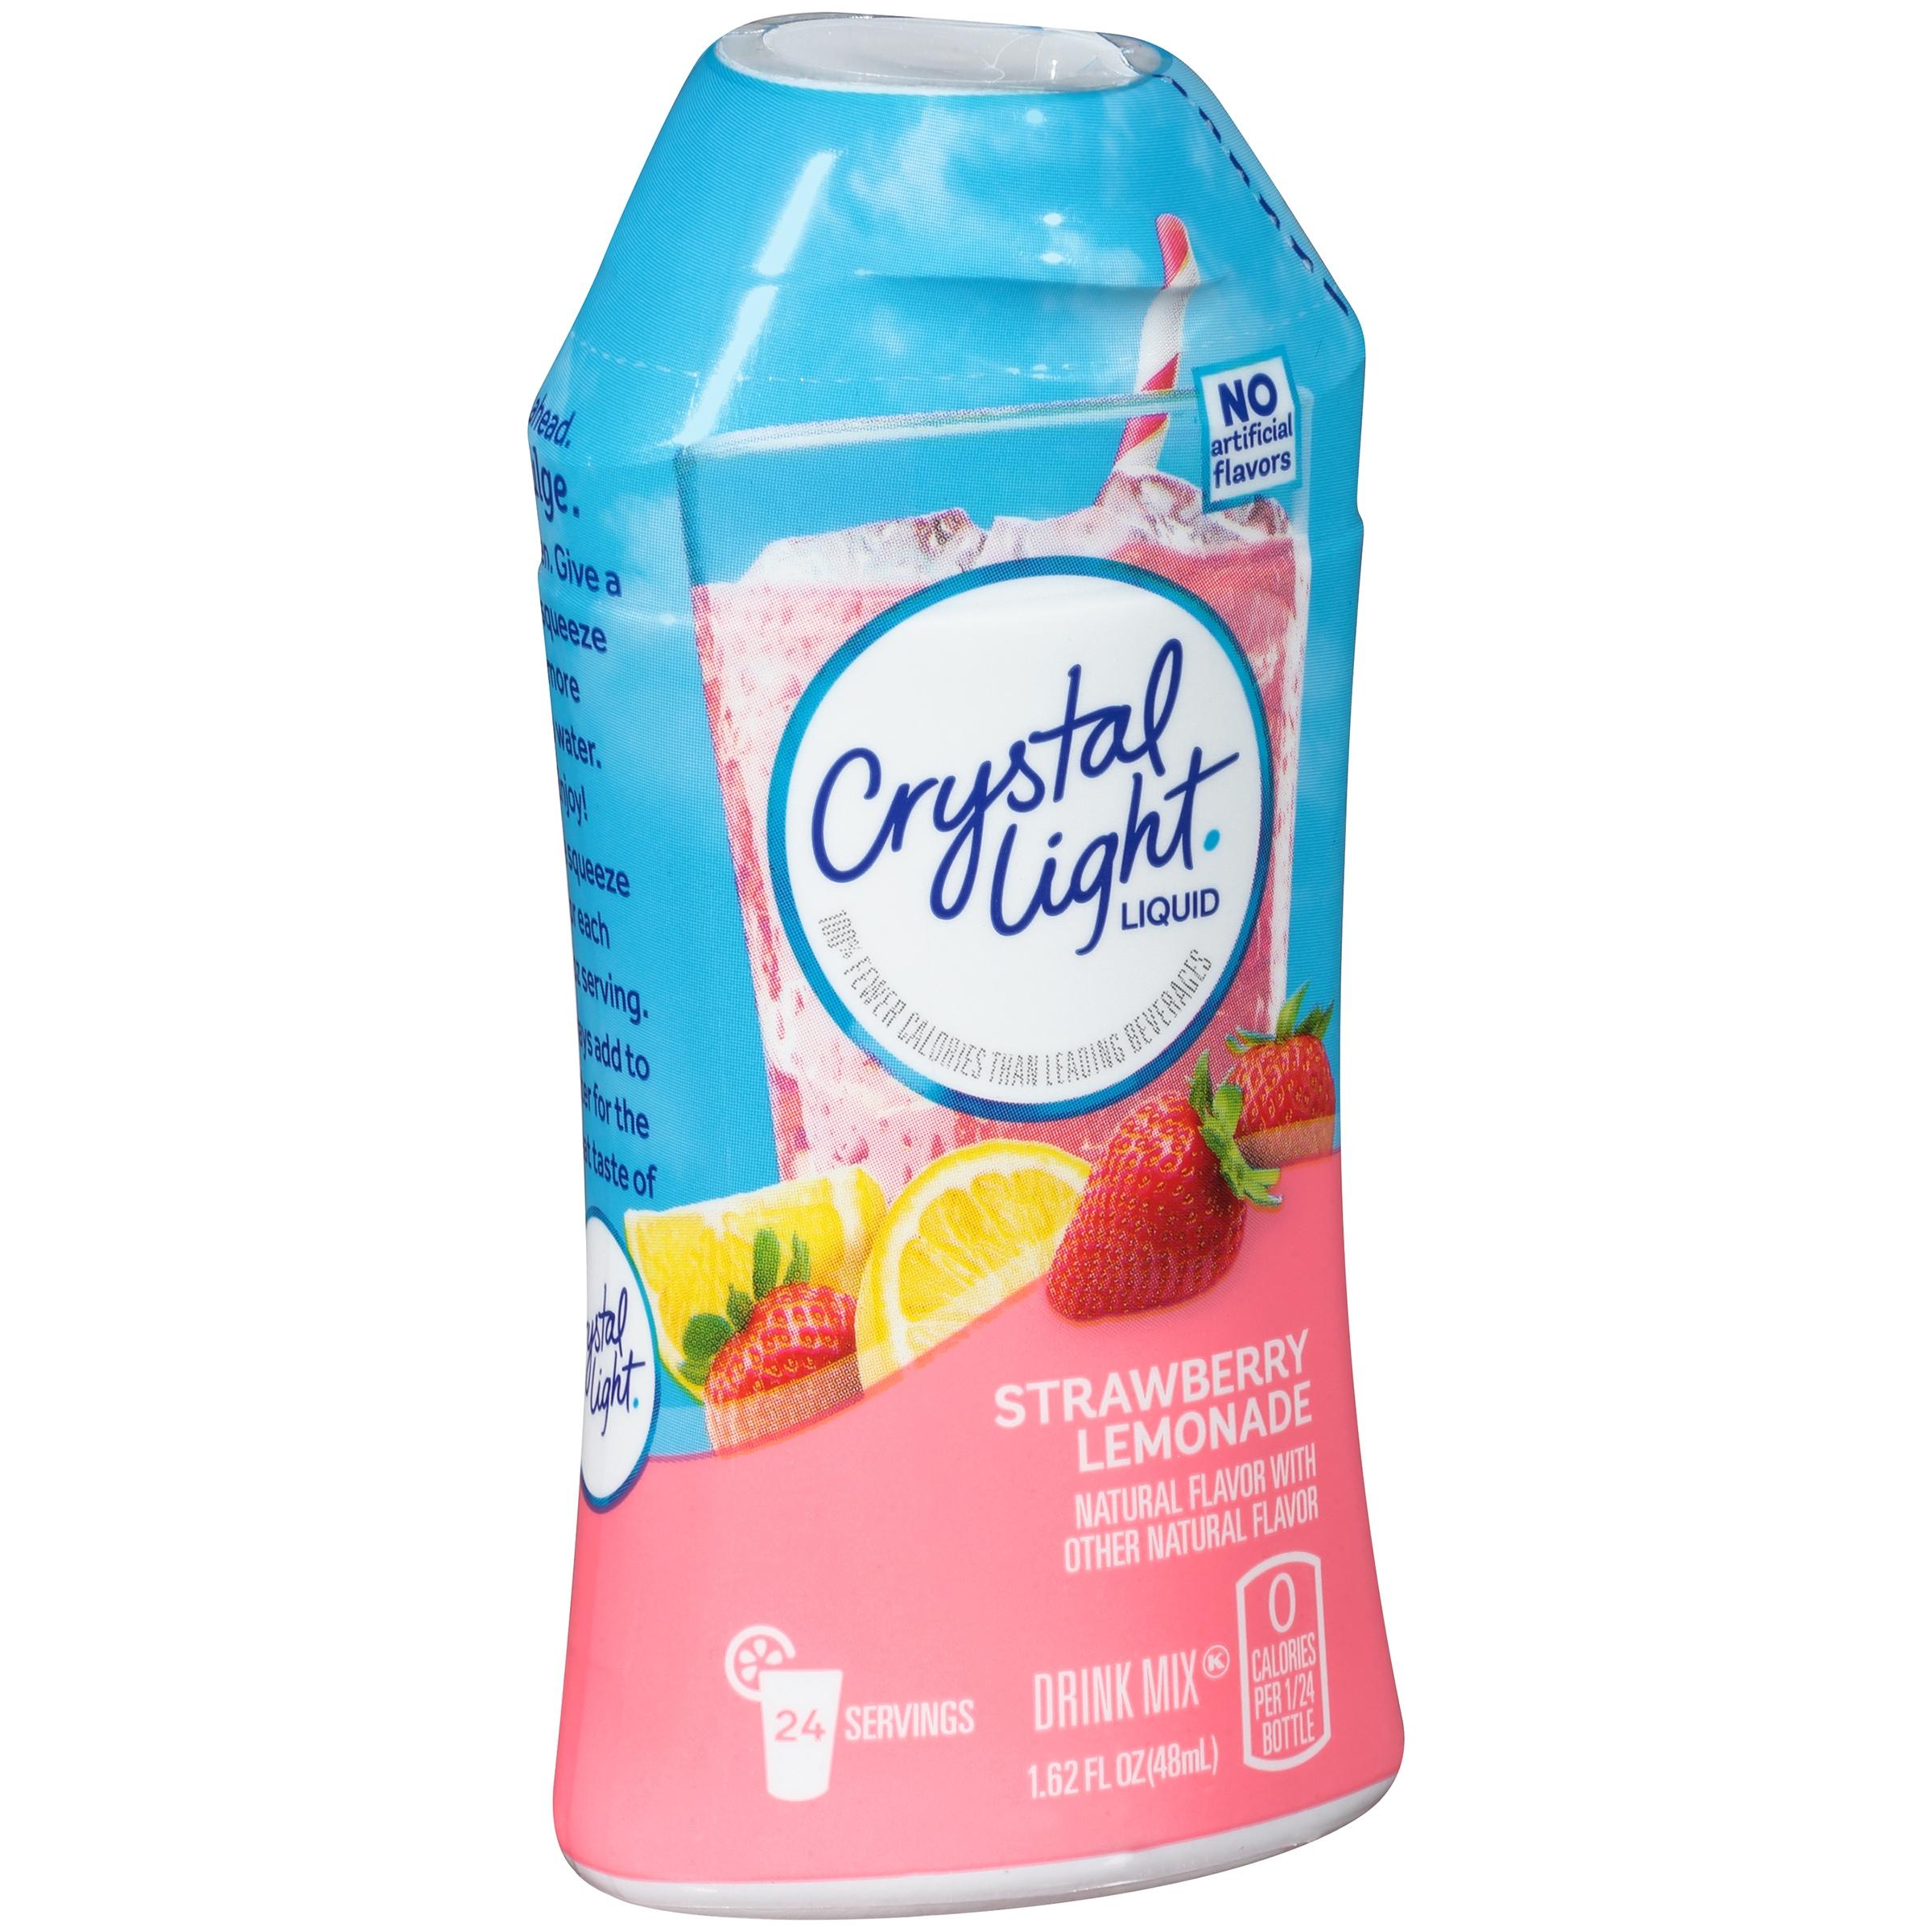 Crystal Light Strawberry Lemonade Liquid Drink Mix 1.62 fl. oz ...